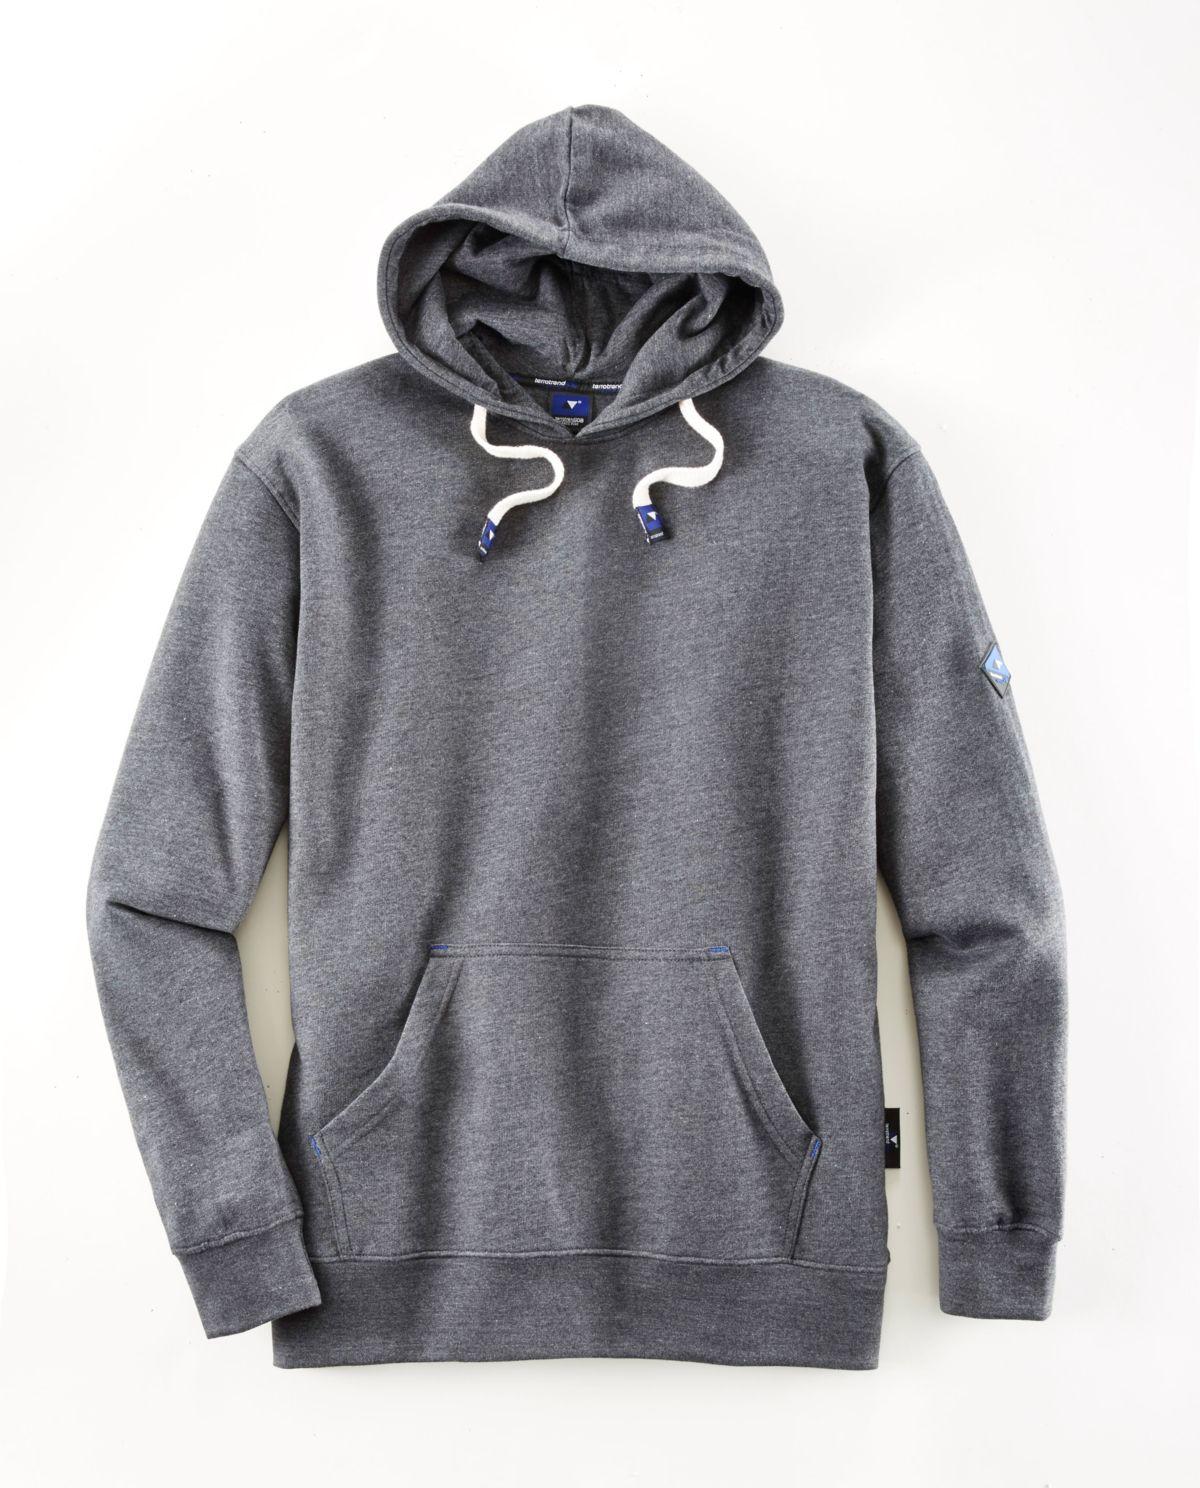 Terratrend Job Sweatshirt mit reflektierendem P...